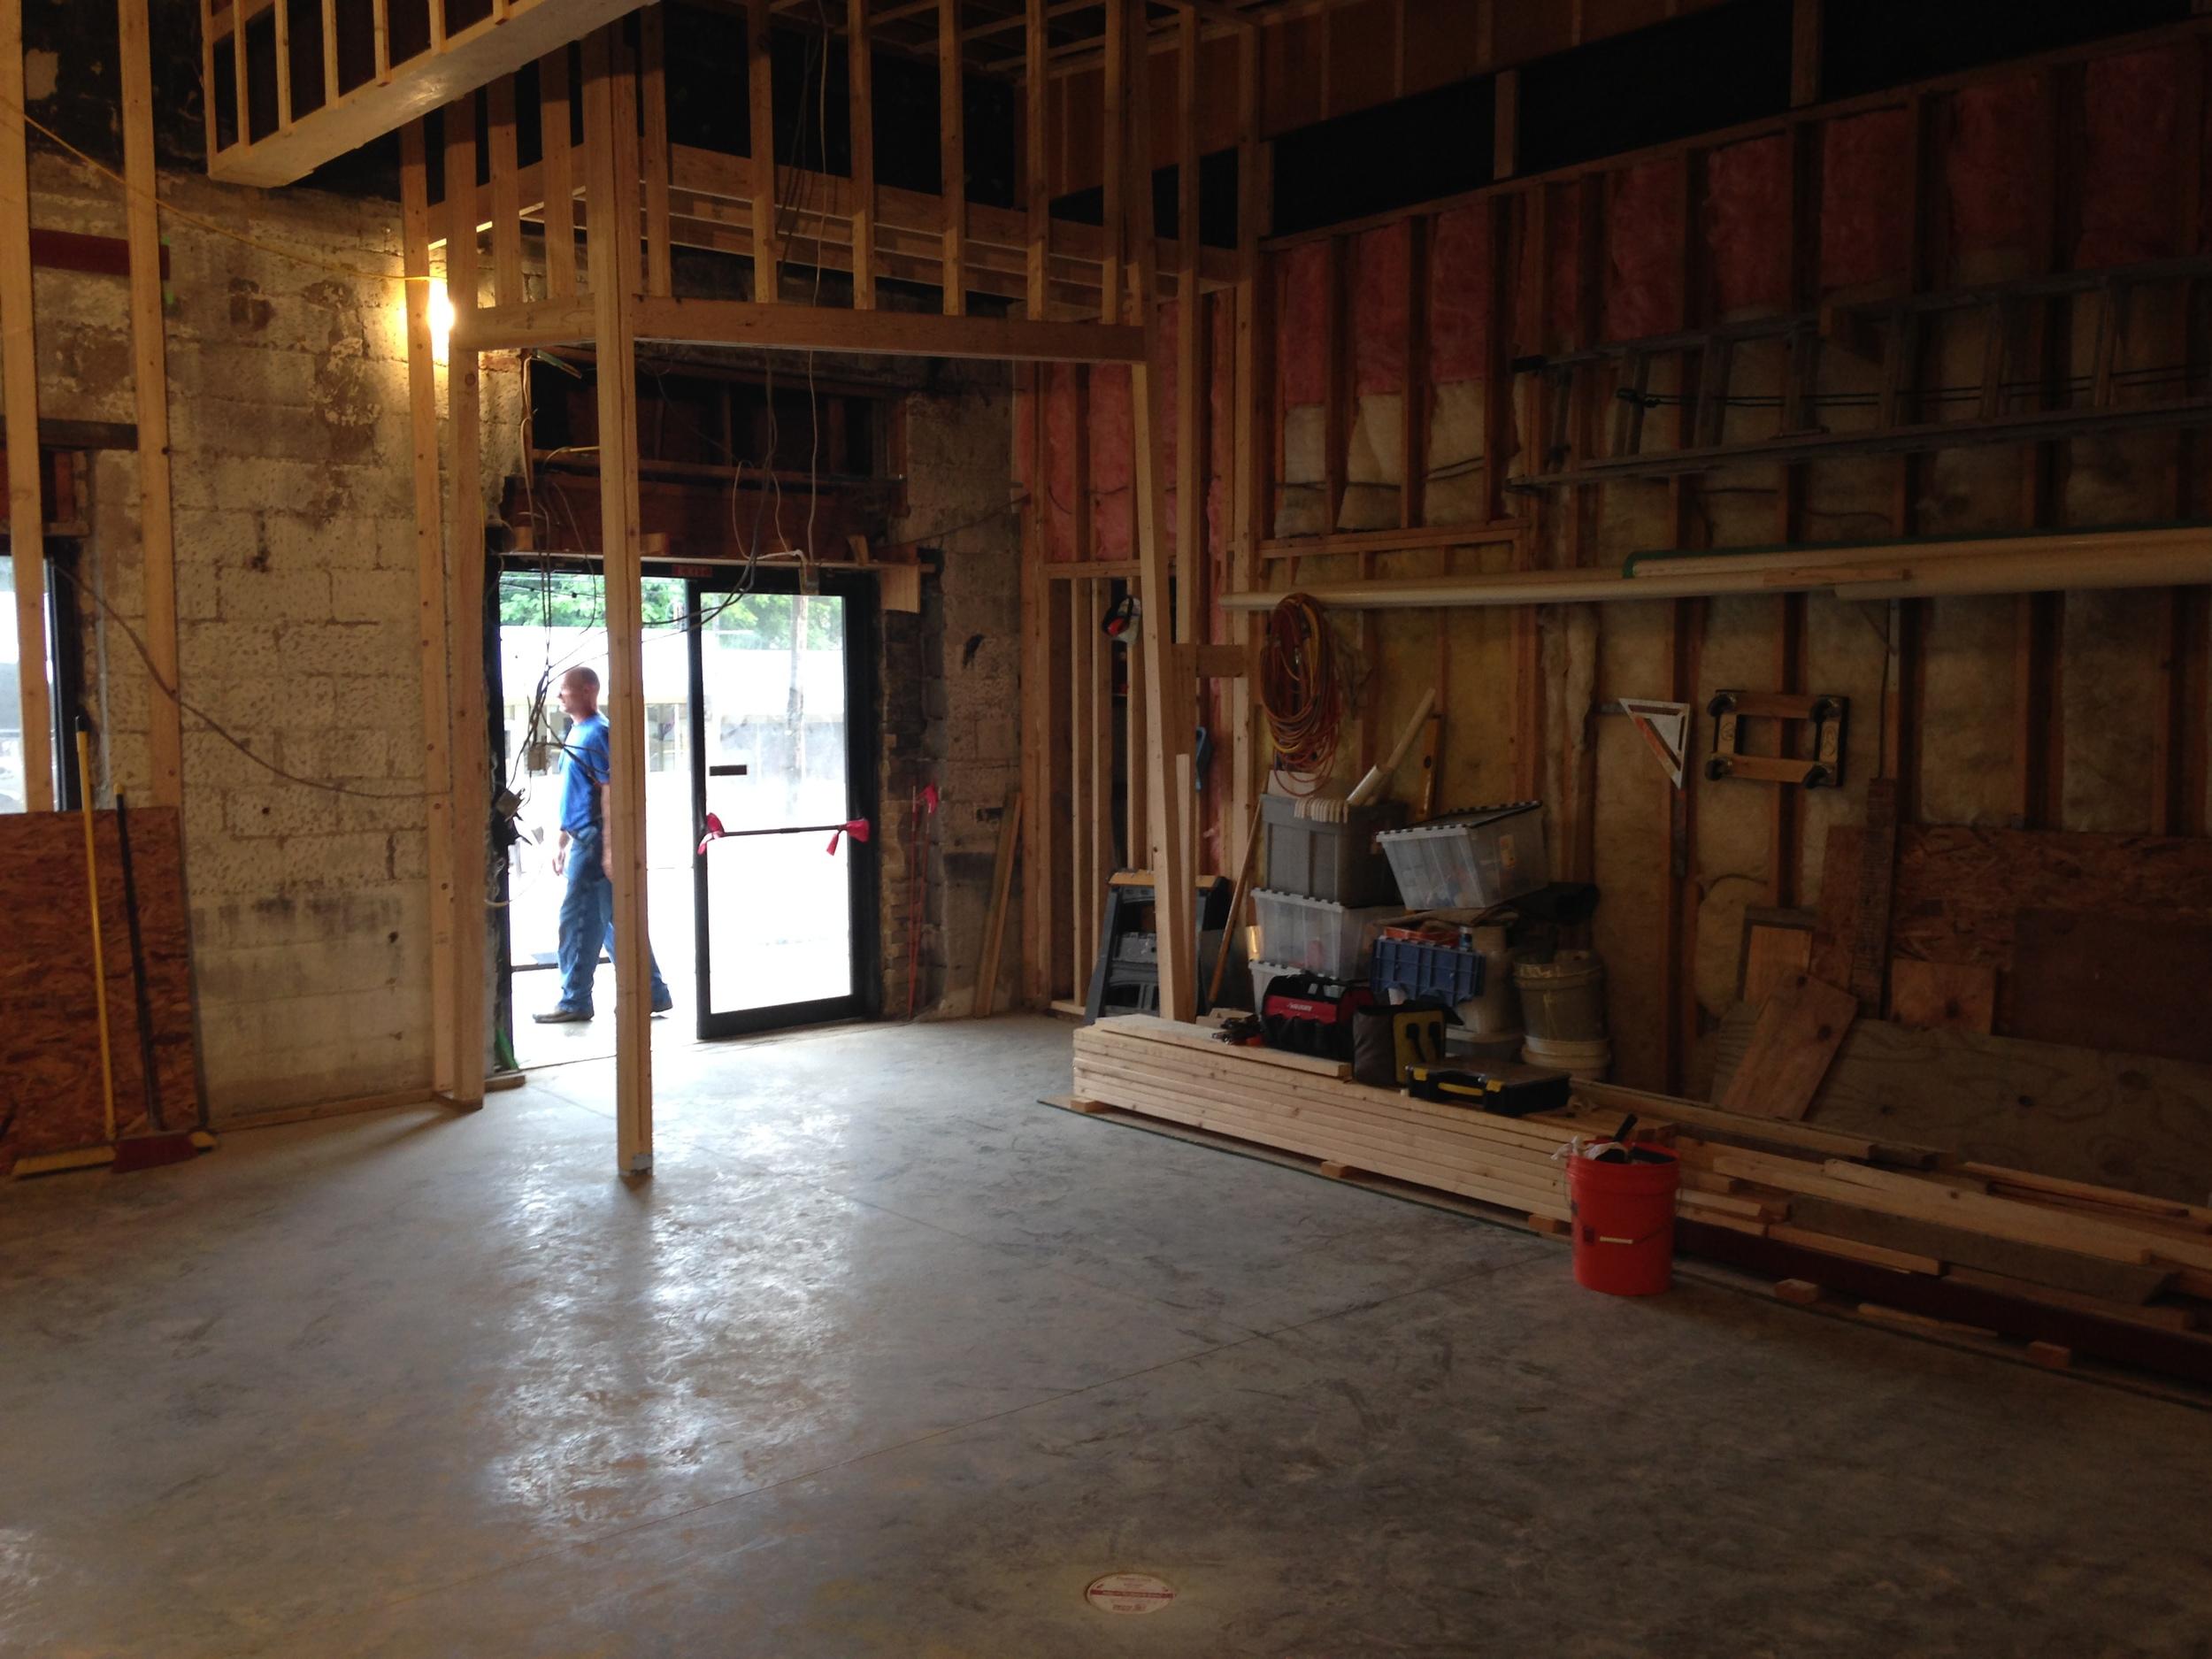 PROCESS: Interiors under construction